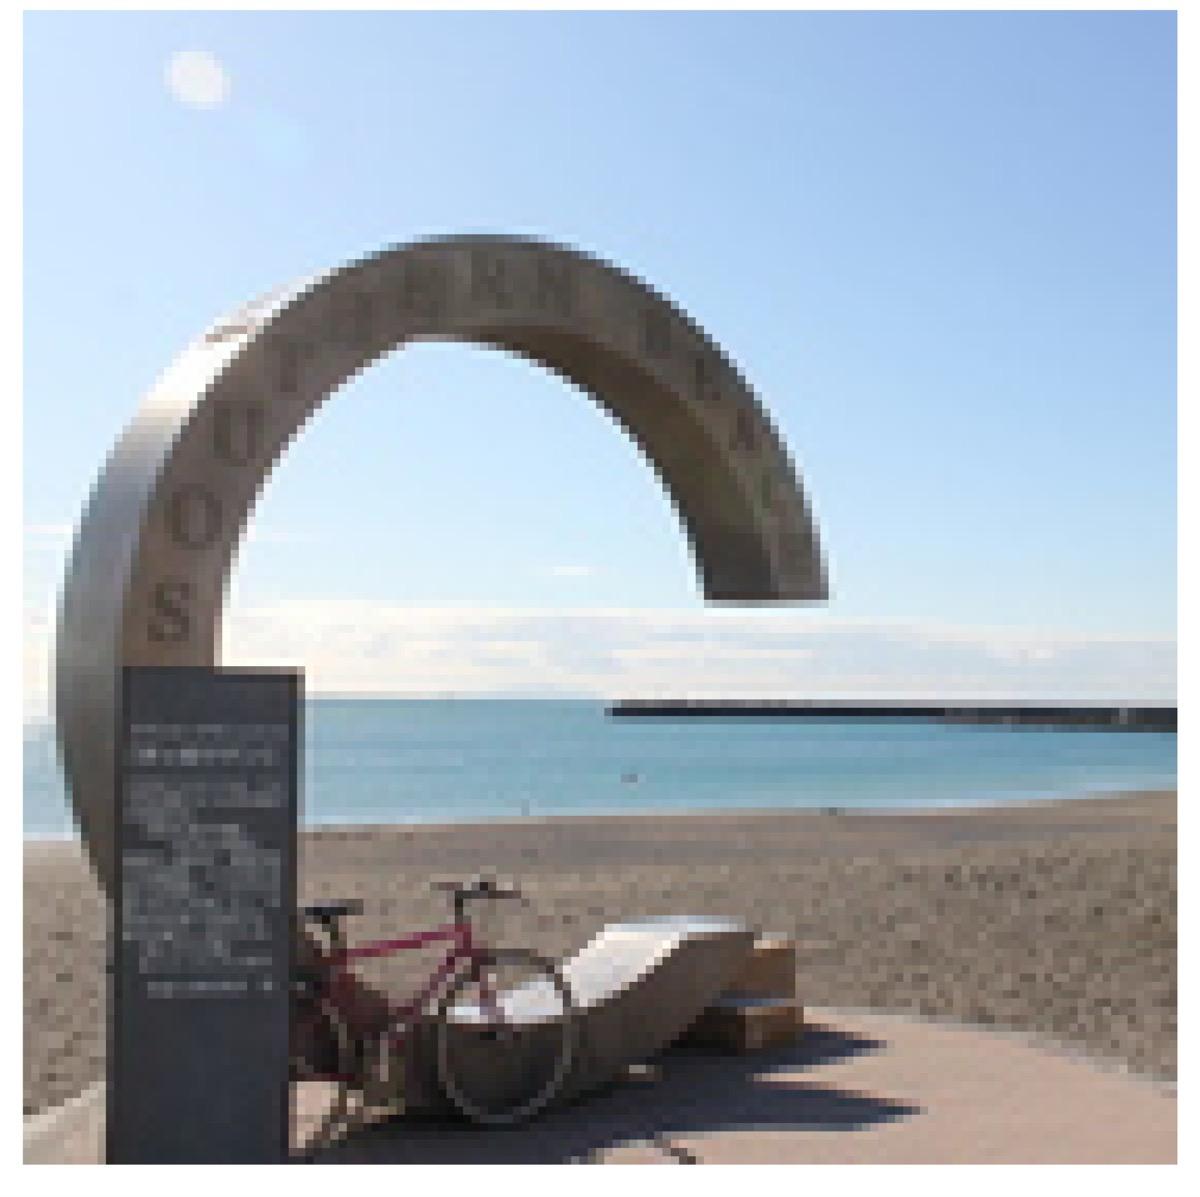 【Web限定記事】3月28日(日)まで 「茅ヶ崎の海にまつわる写真」募集中 インスタで投稿を | 茅ヶ崎 | タウンニュース